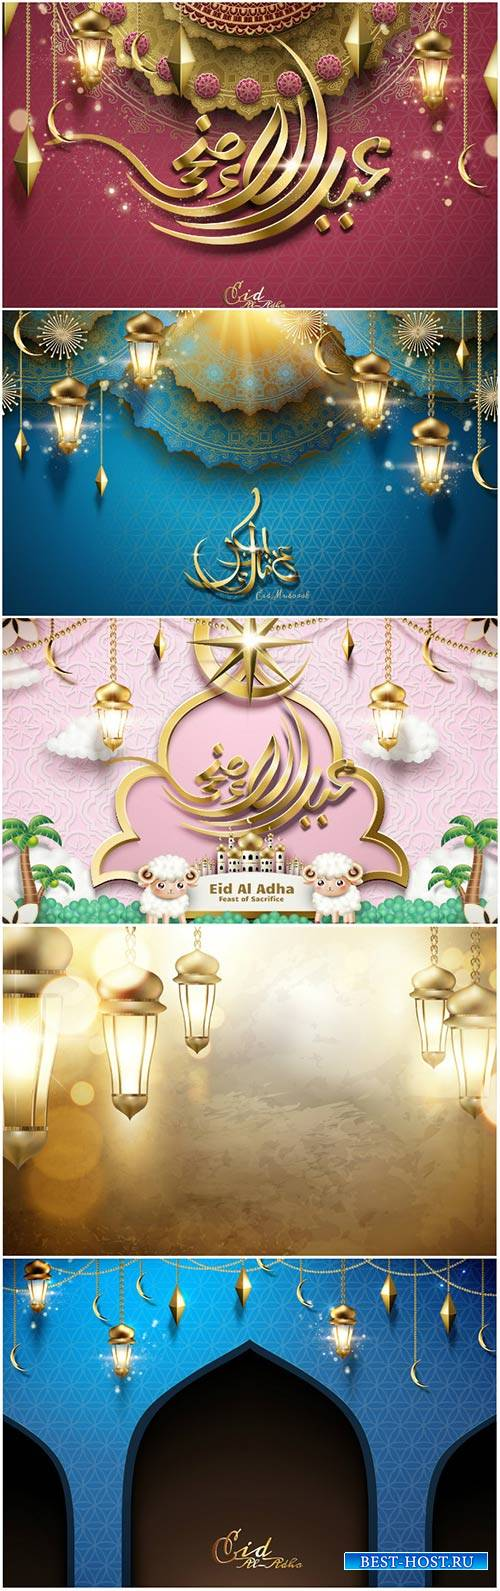 Eid Al Adha calligraphy vector design